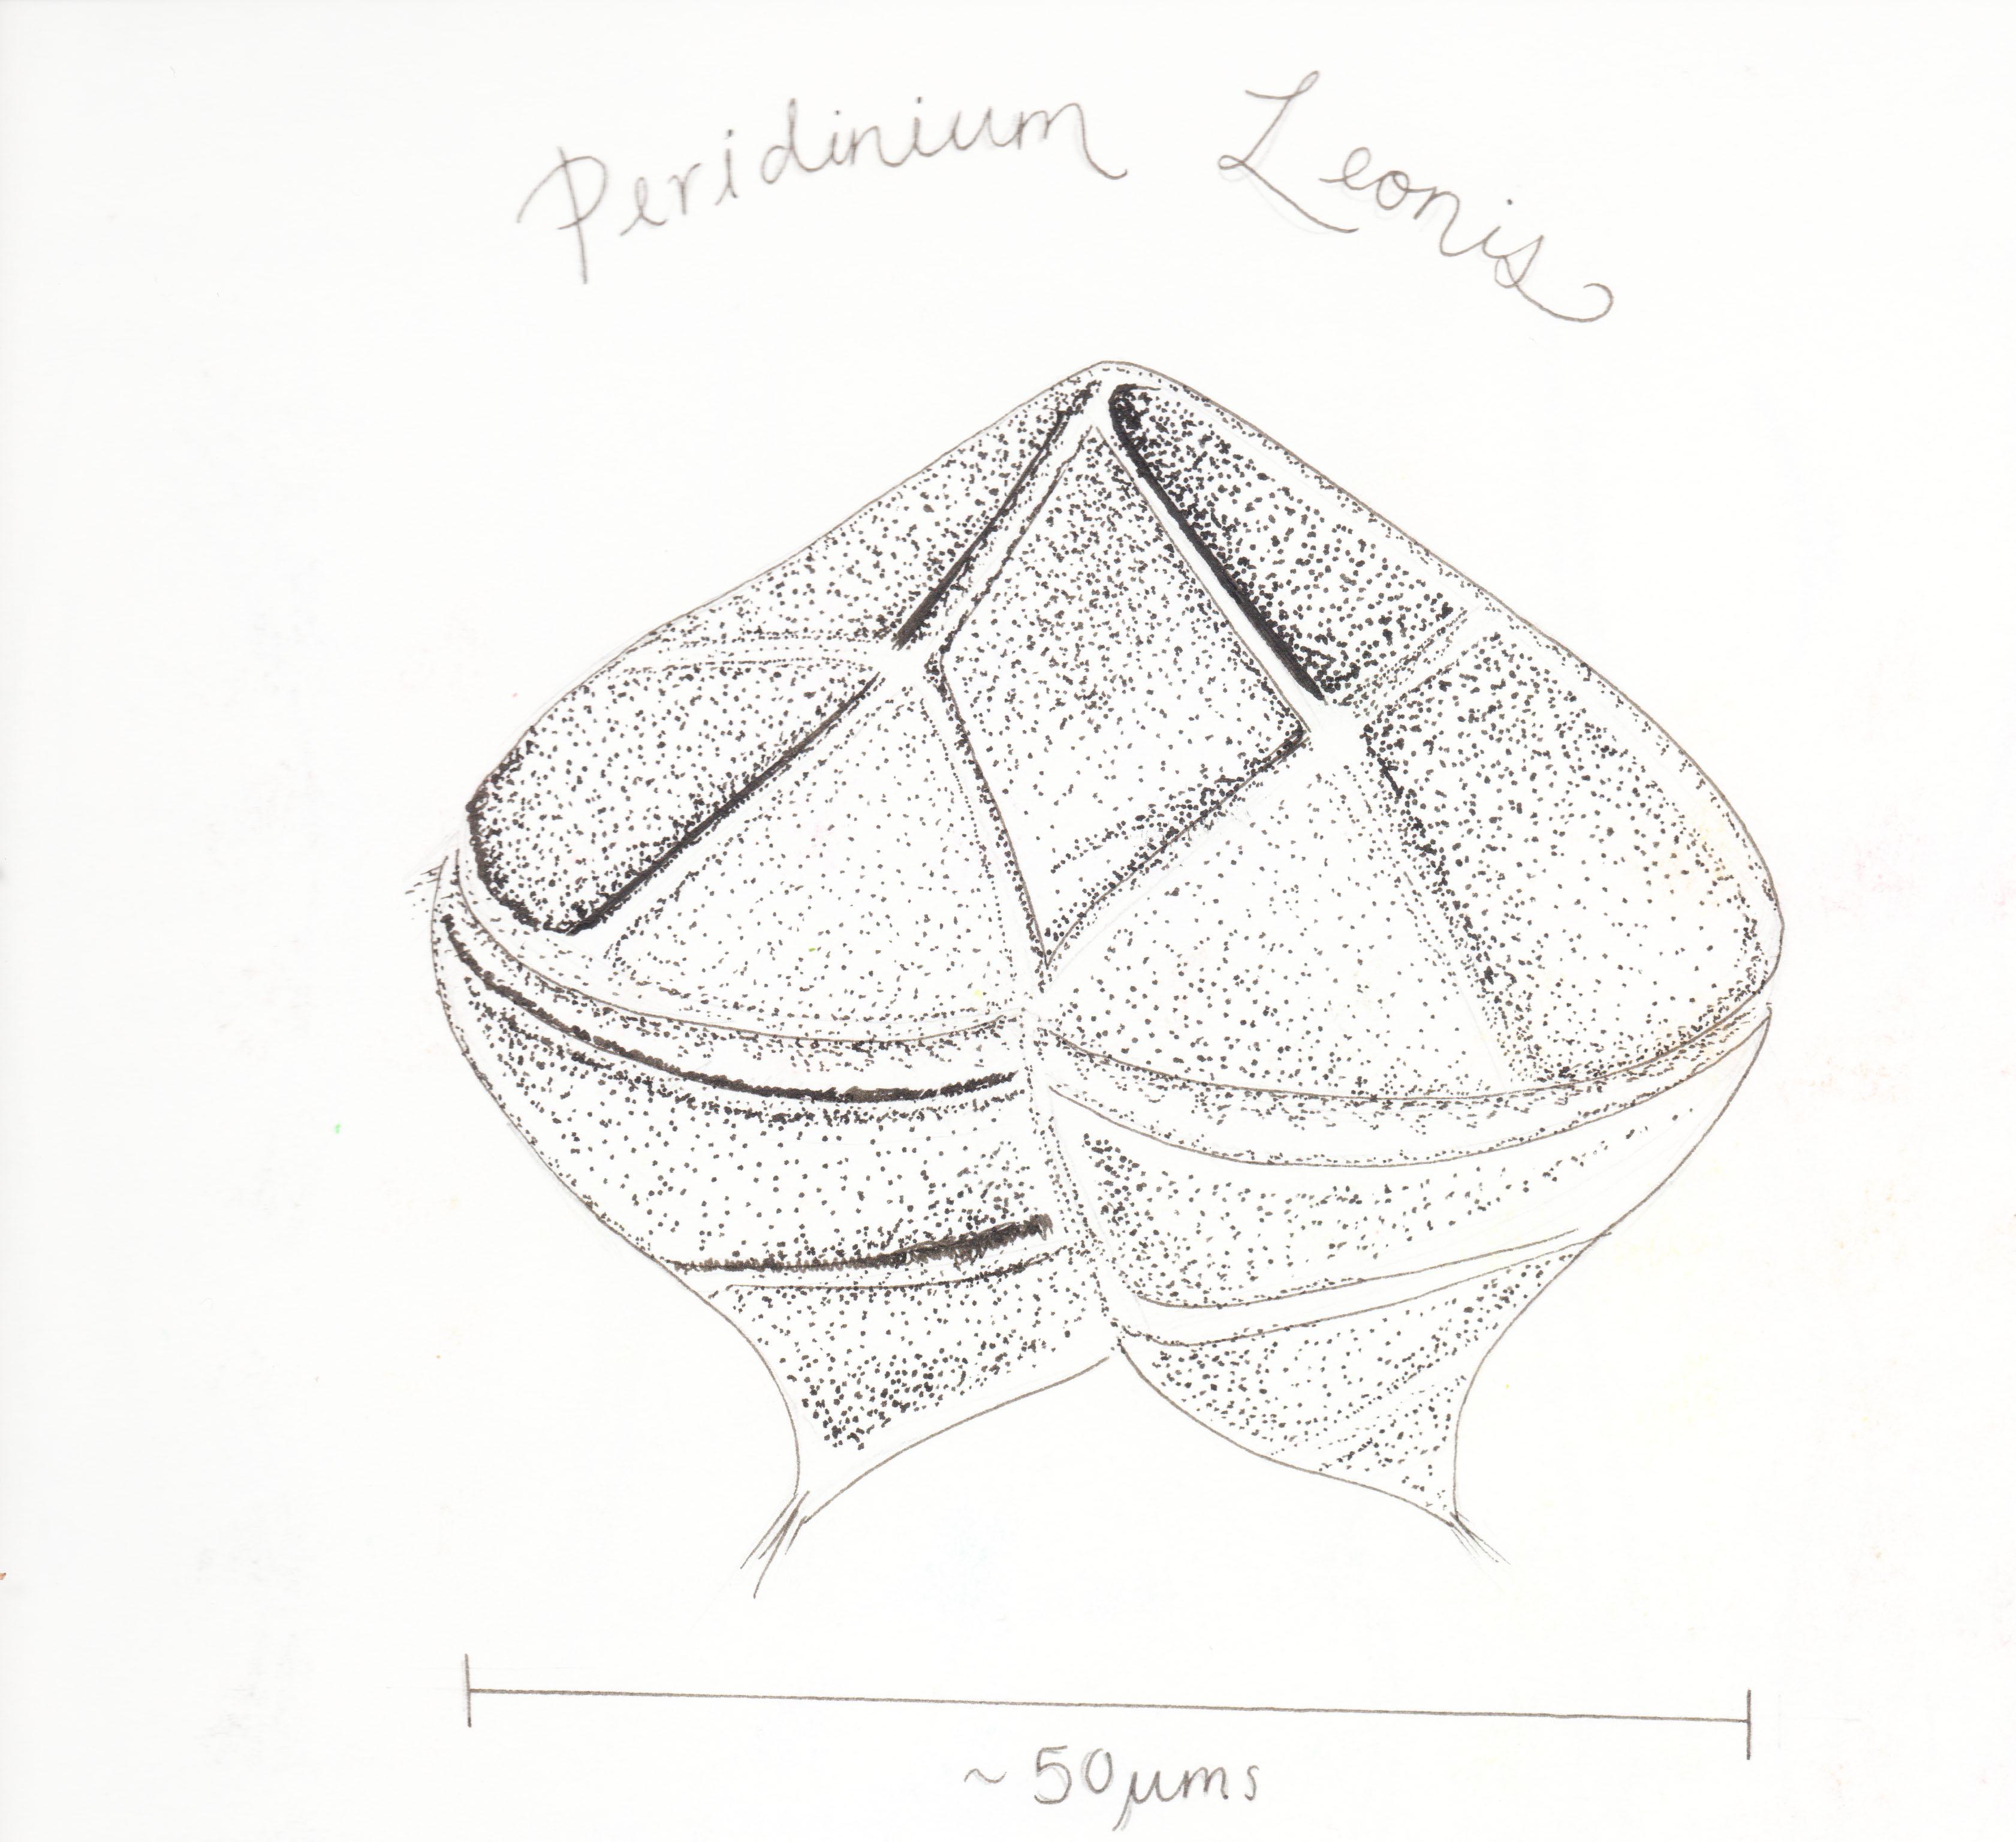 Protoperidinium Leonis Stipple edited